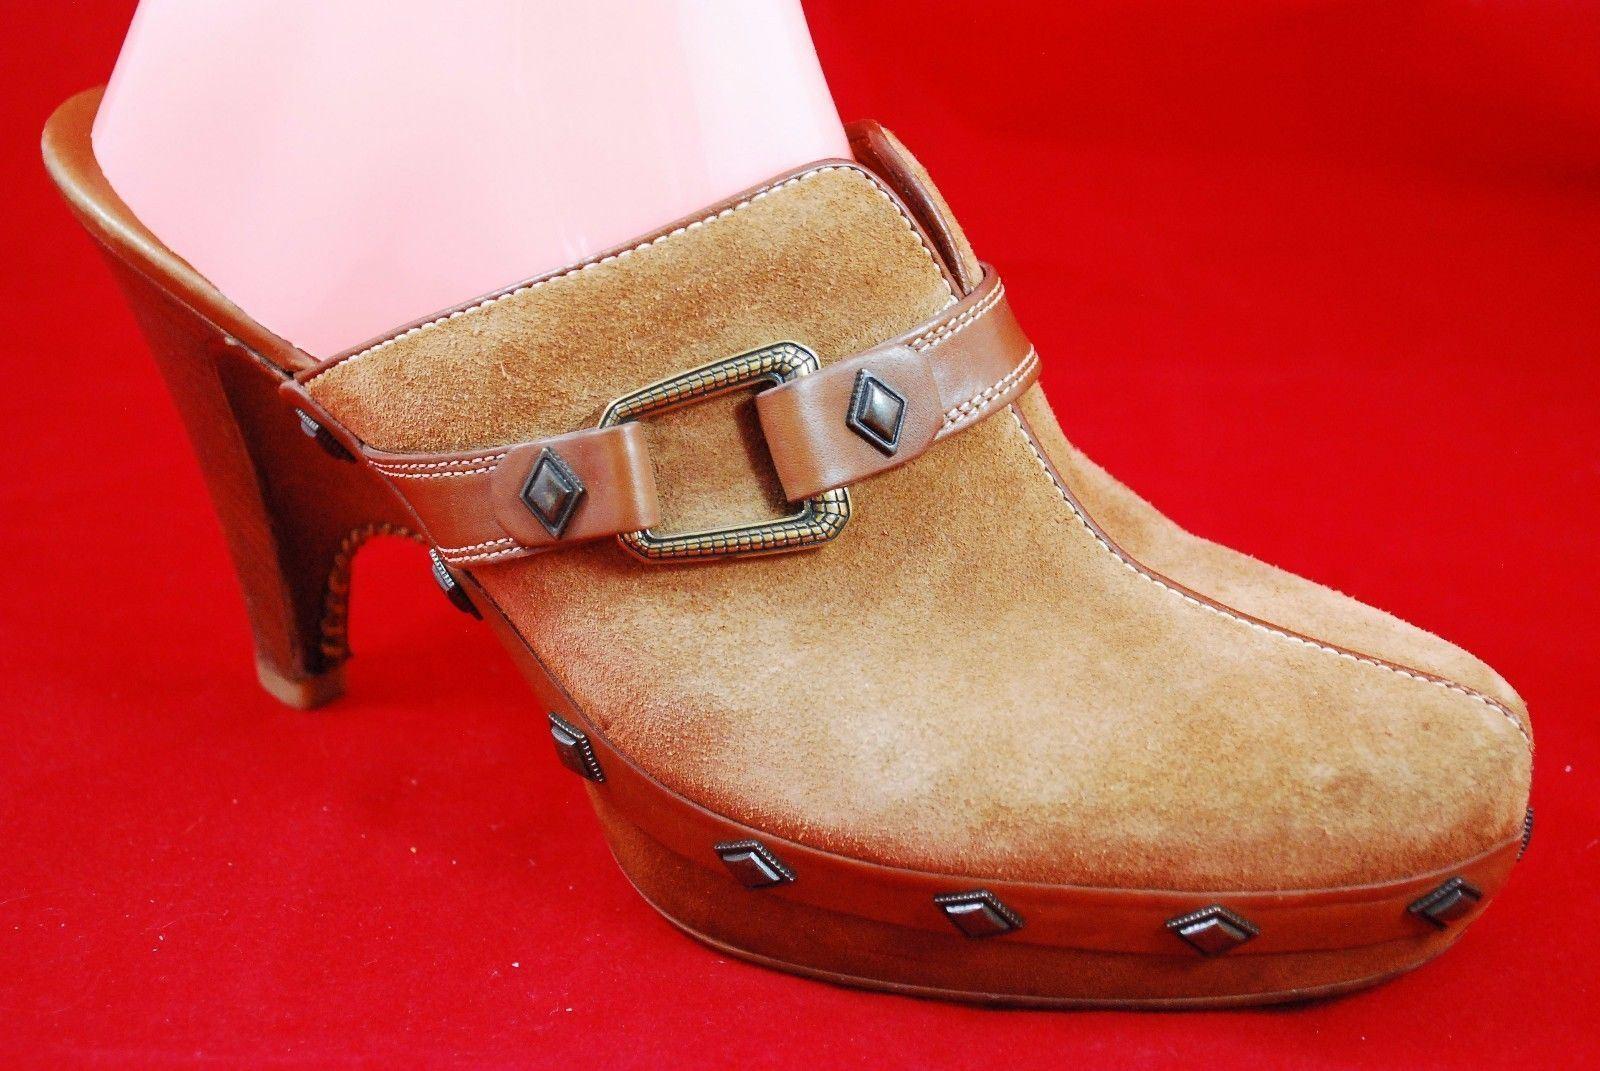 Cole Haan Schuhes Damenschuhe 10 B Tan/Braun Leder Mule Clog 4